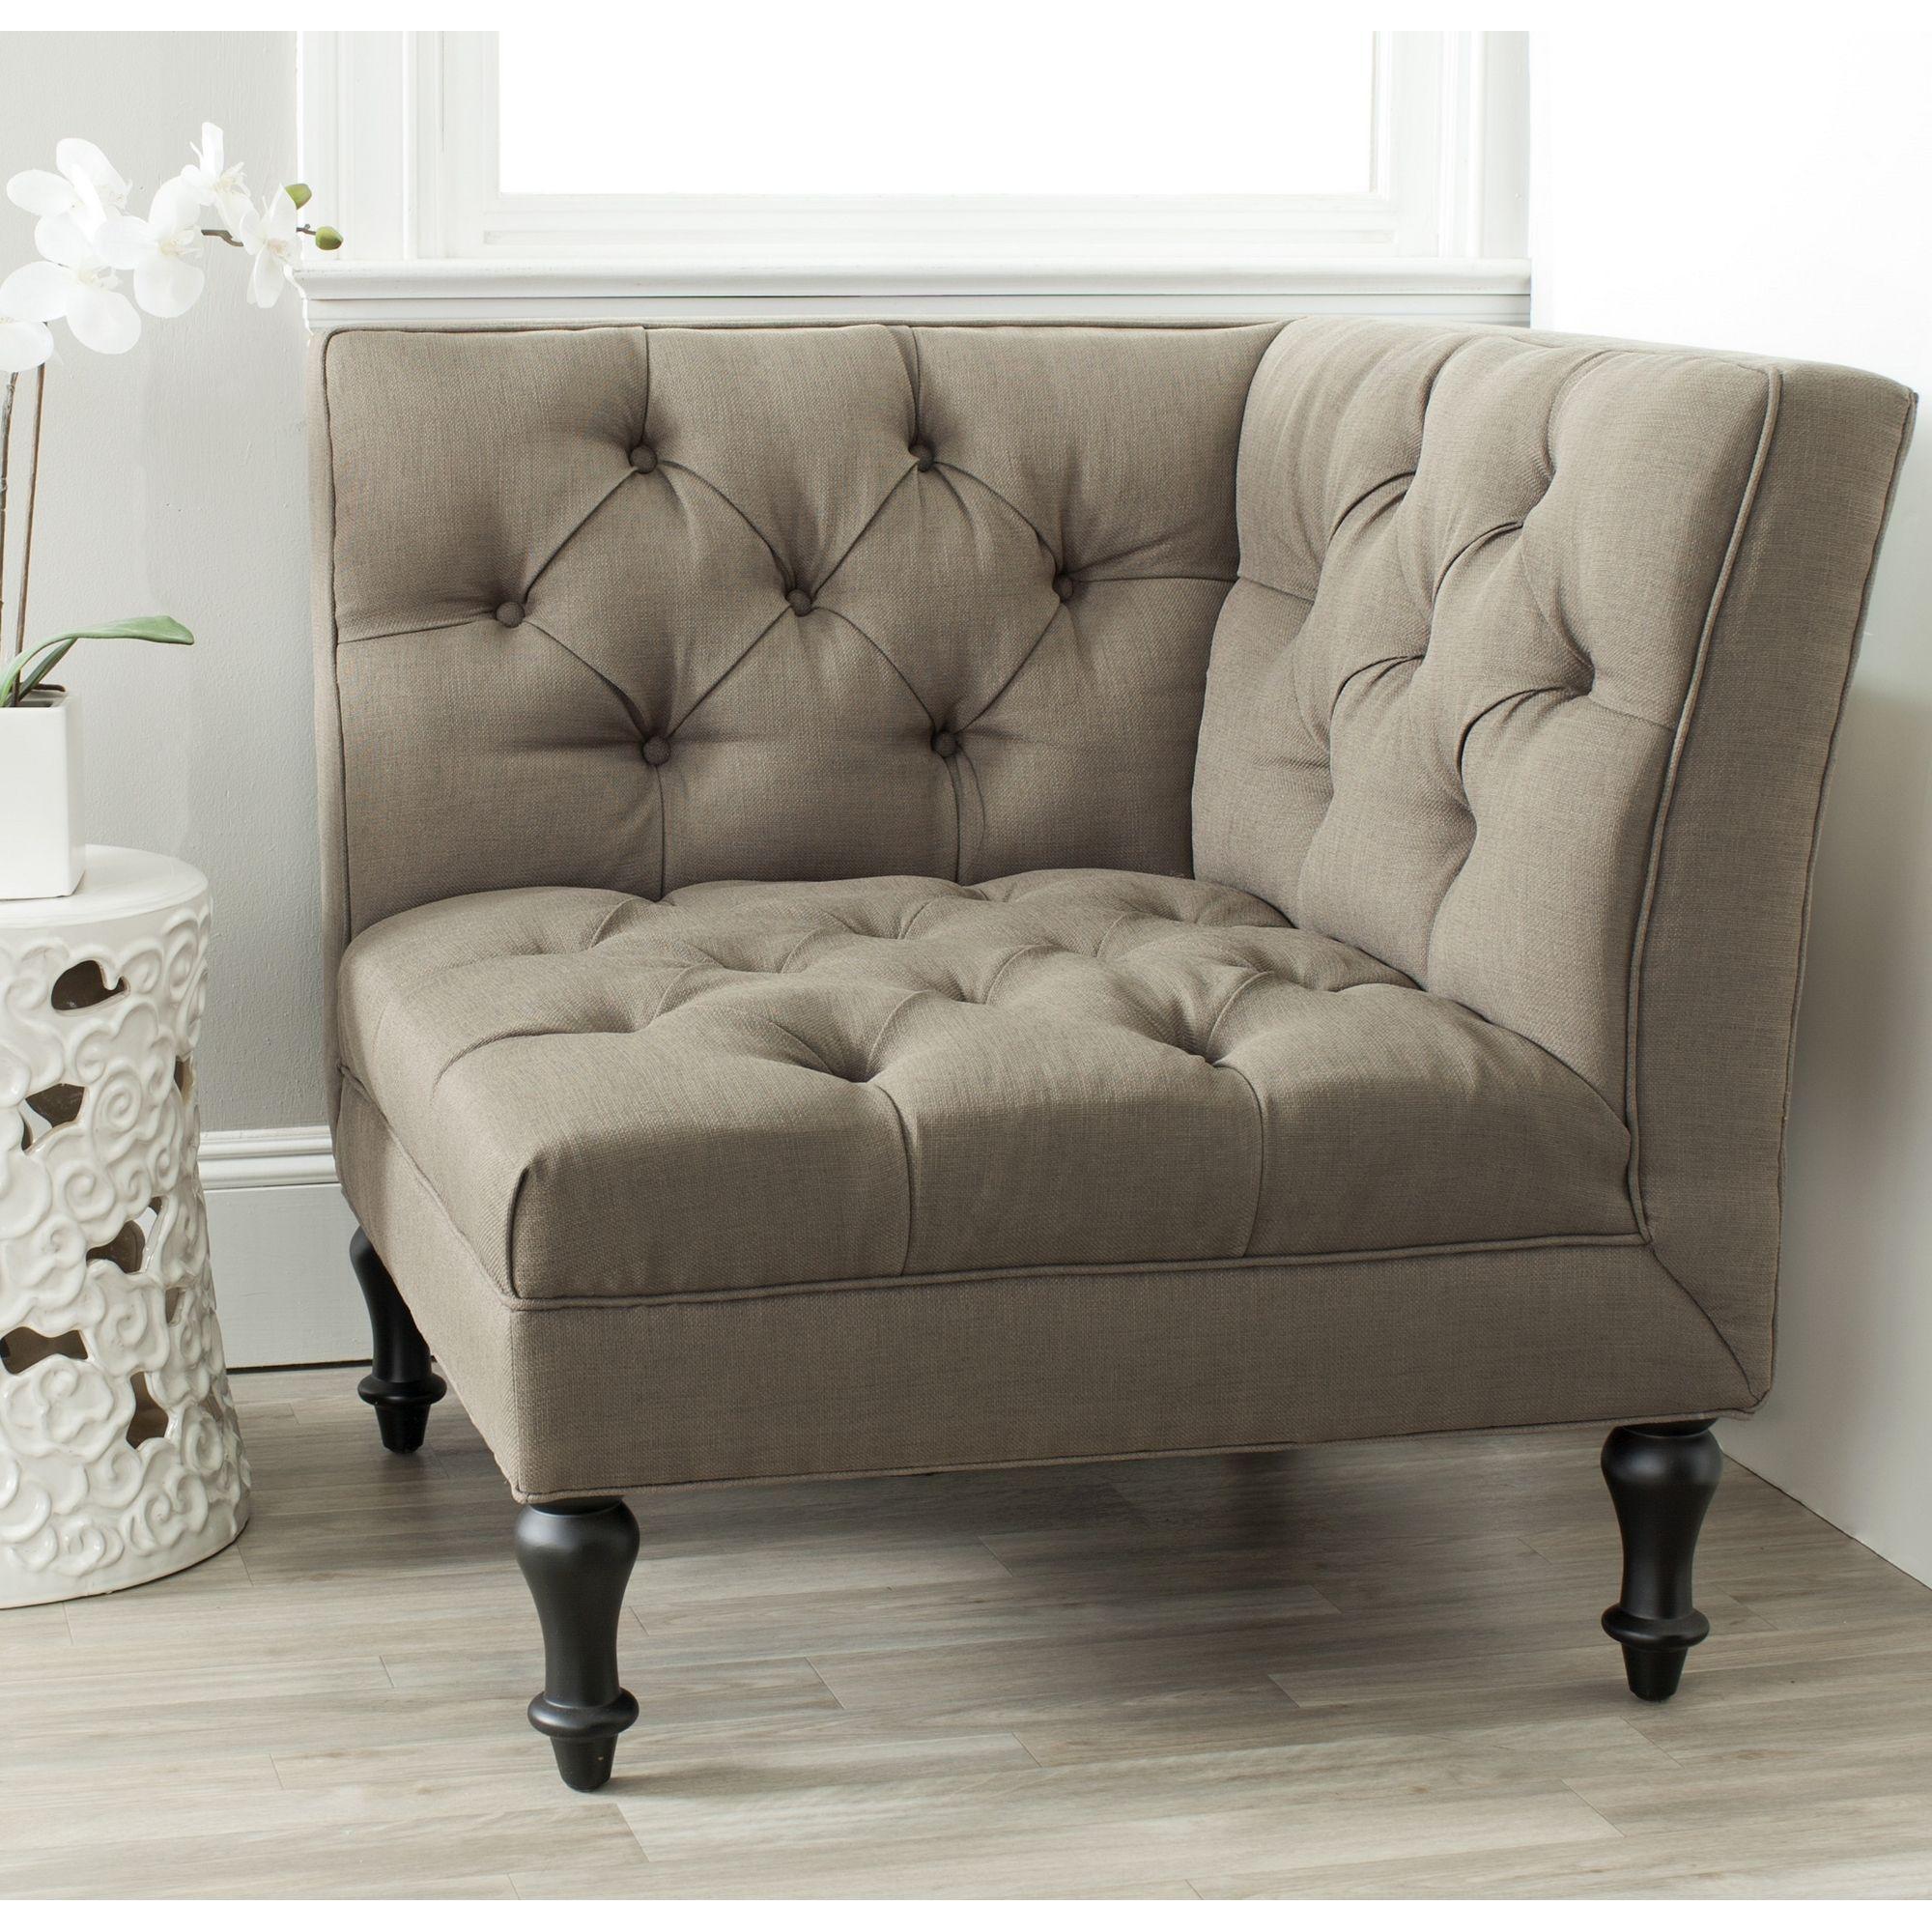 Safavieh Jack Sky Blue Corner Chair Home Decor Accent: Safavieh Jack Olive Club Chair (MCR4643A), Green (Wood